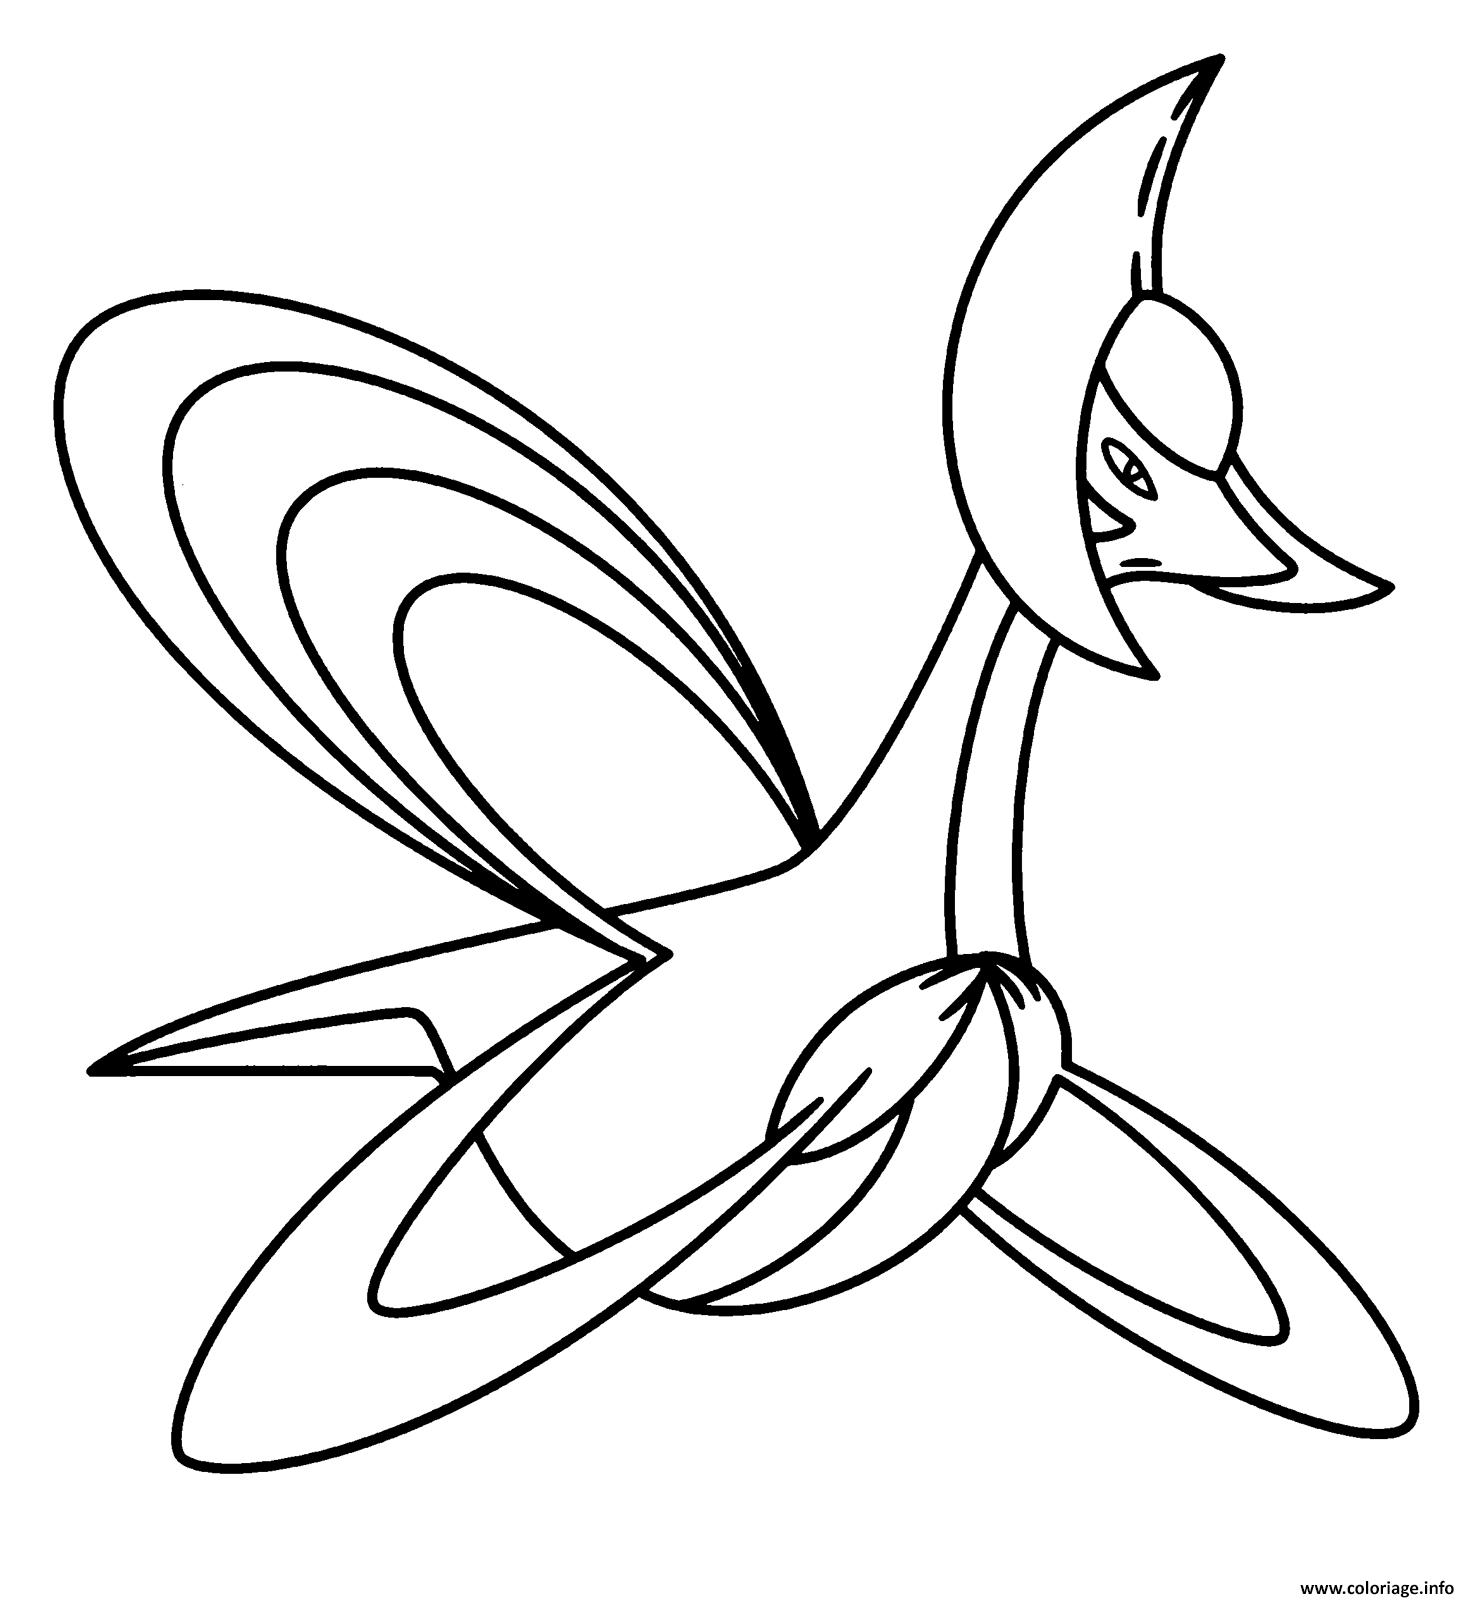 Coloriage 488 Cresselia Pokemon Legendaire Jecolorie Com